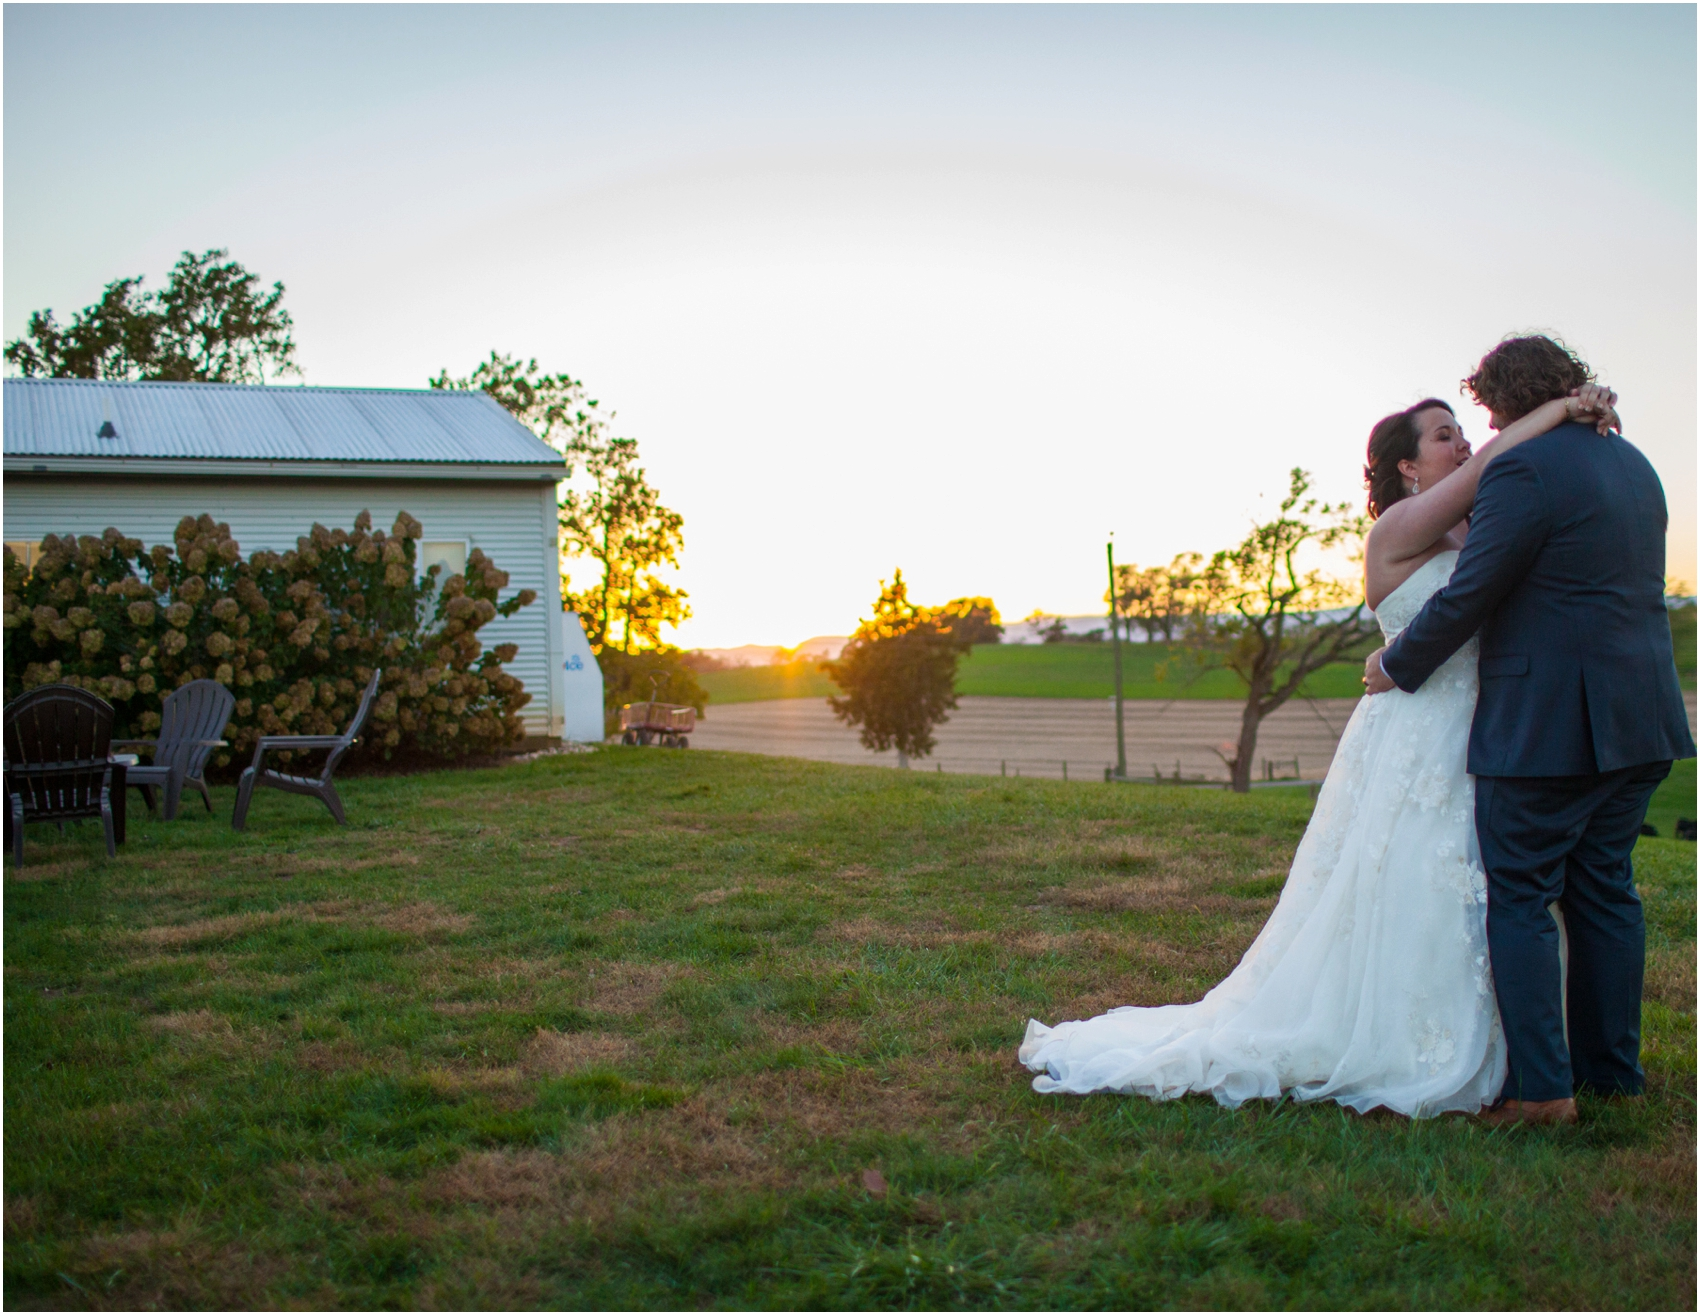 On-Sunny-Slope-Farm-Fall-Virginia-Wedding-3547.jpg